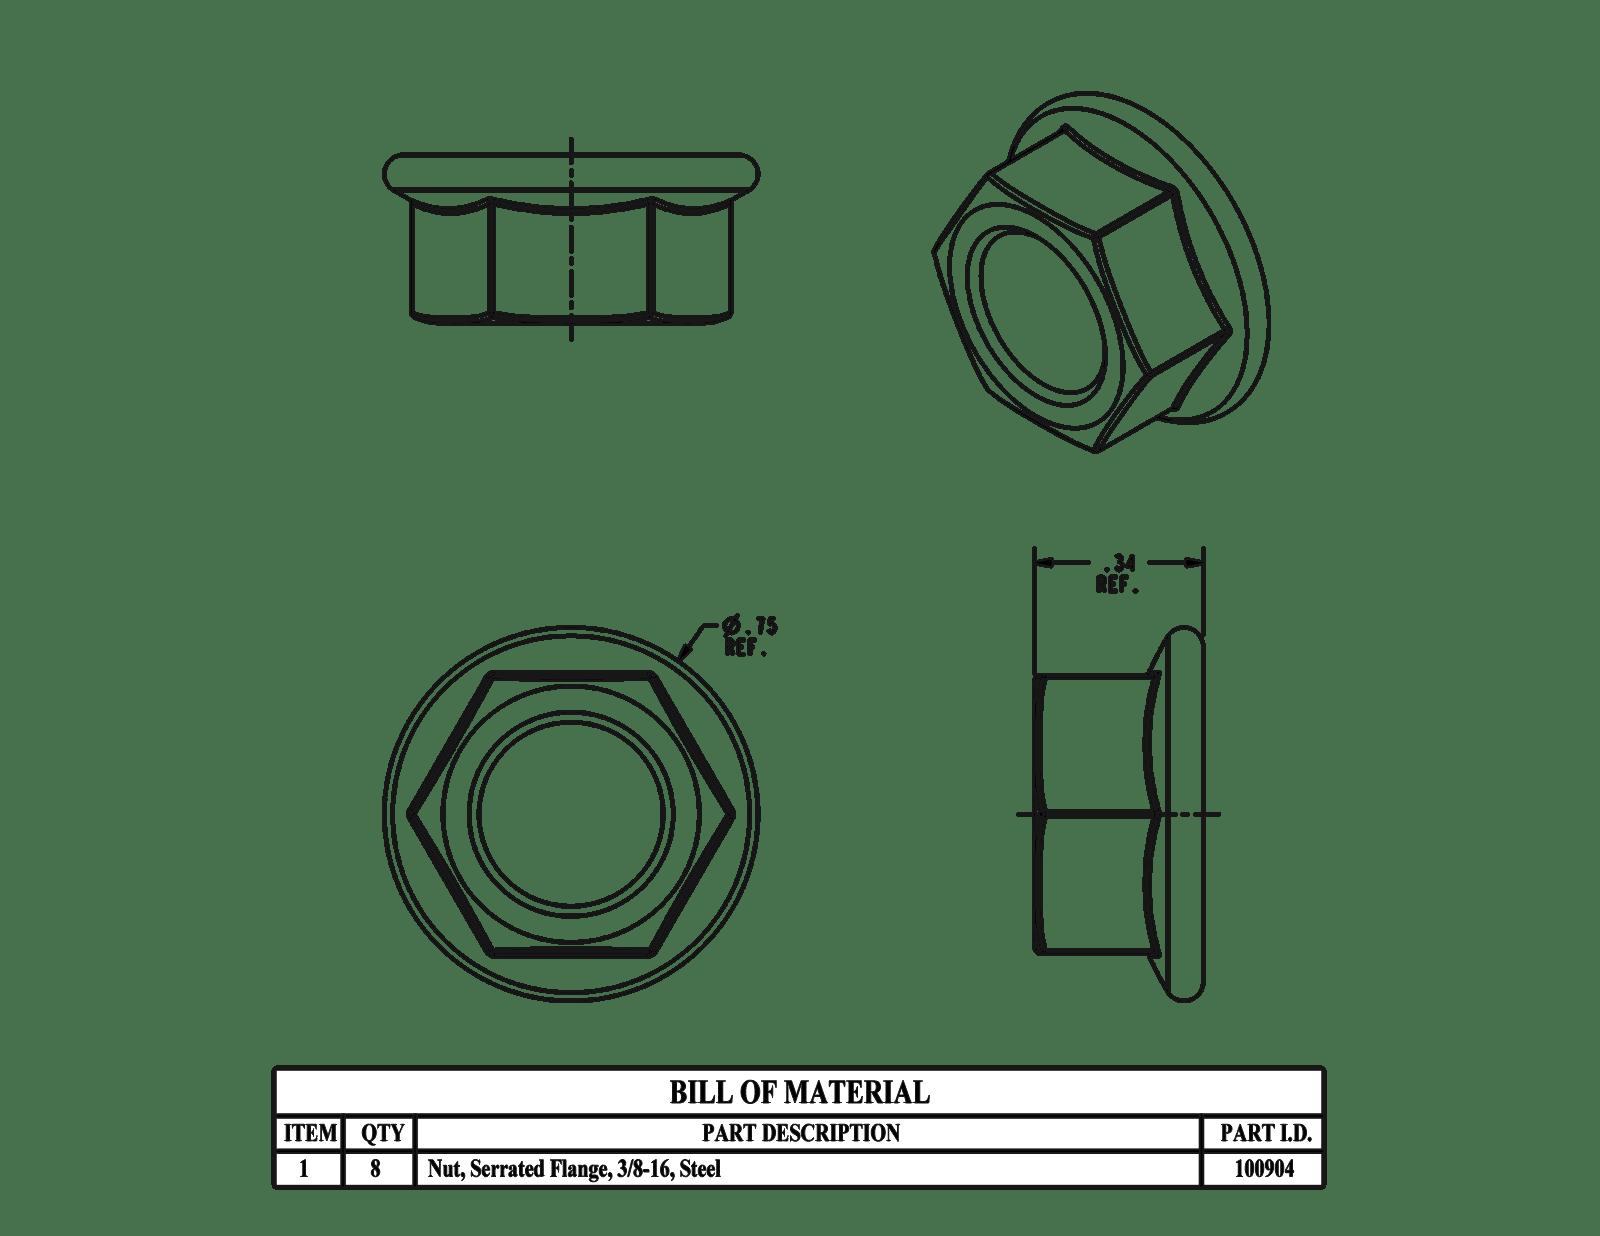 SCE-102298 Saginaw Bolt Pack, Subpanel 3/8-16 (4pcs) NEMA